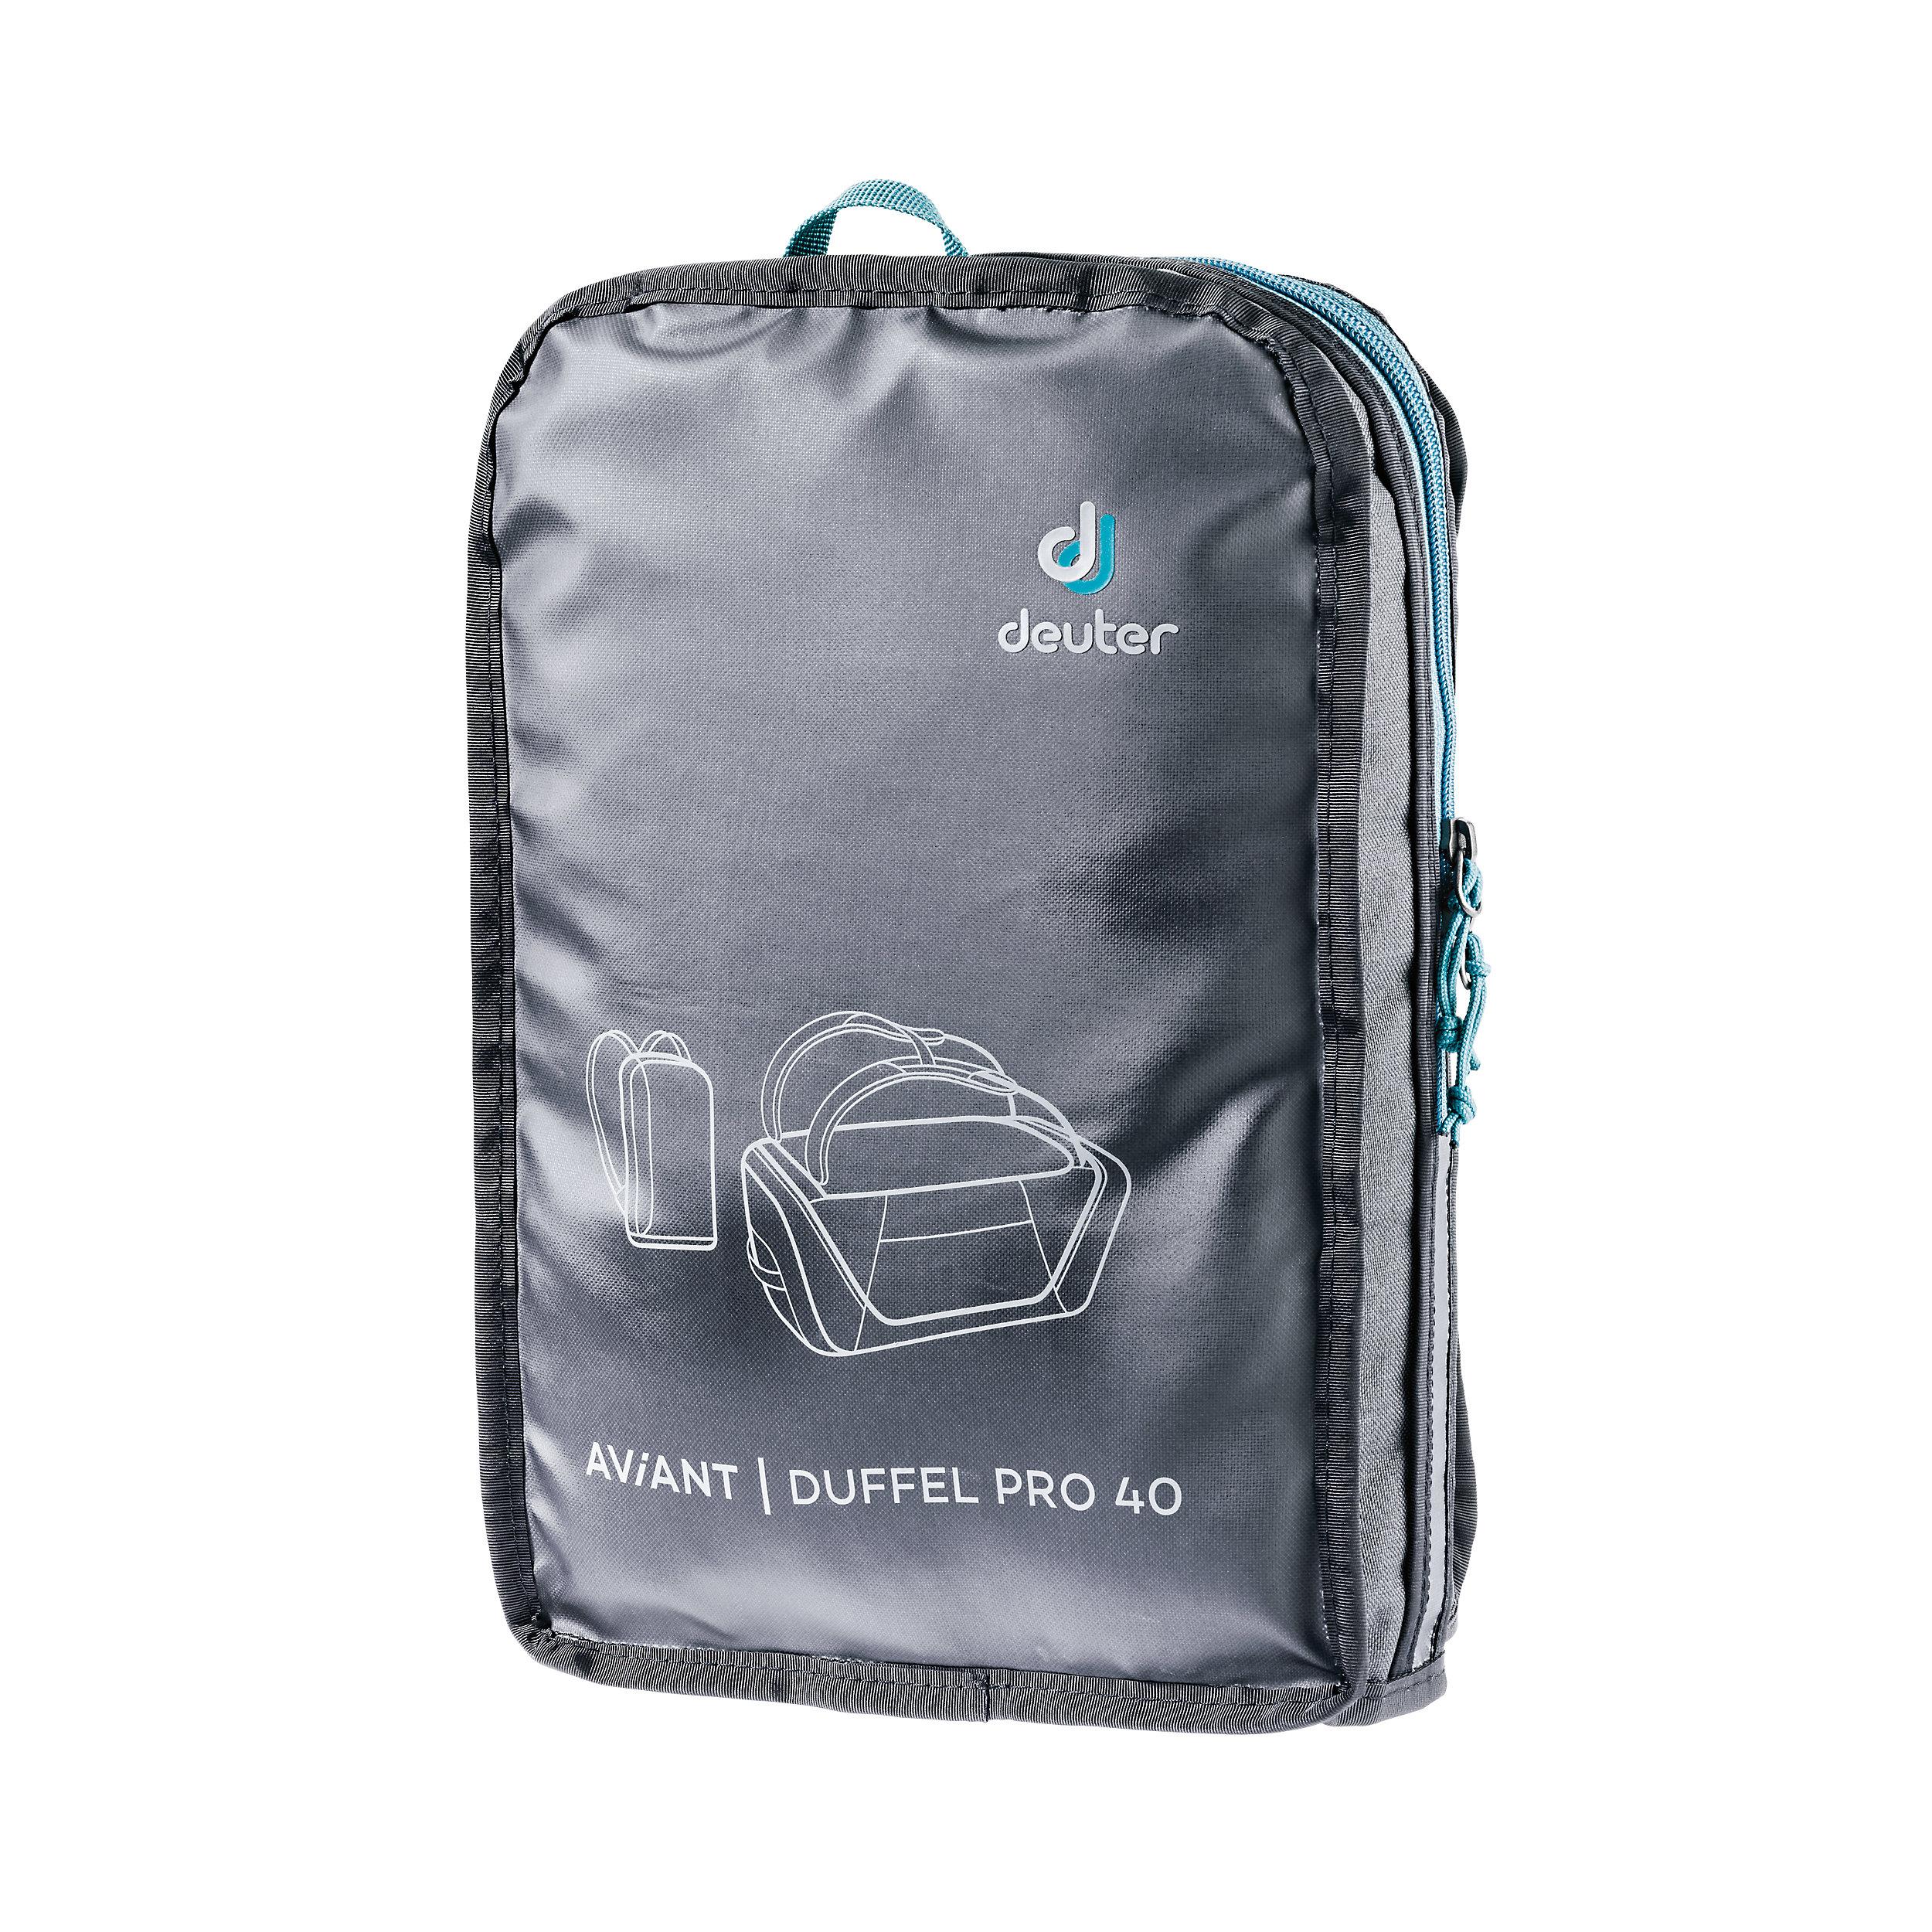 Travel Bag AViANT Duffel Pro 40 AViANT Series